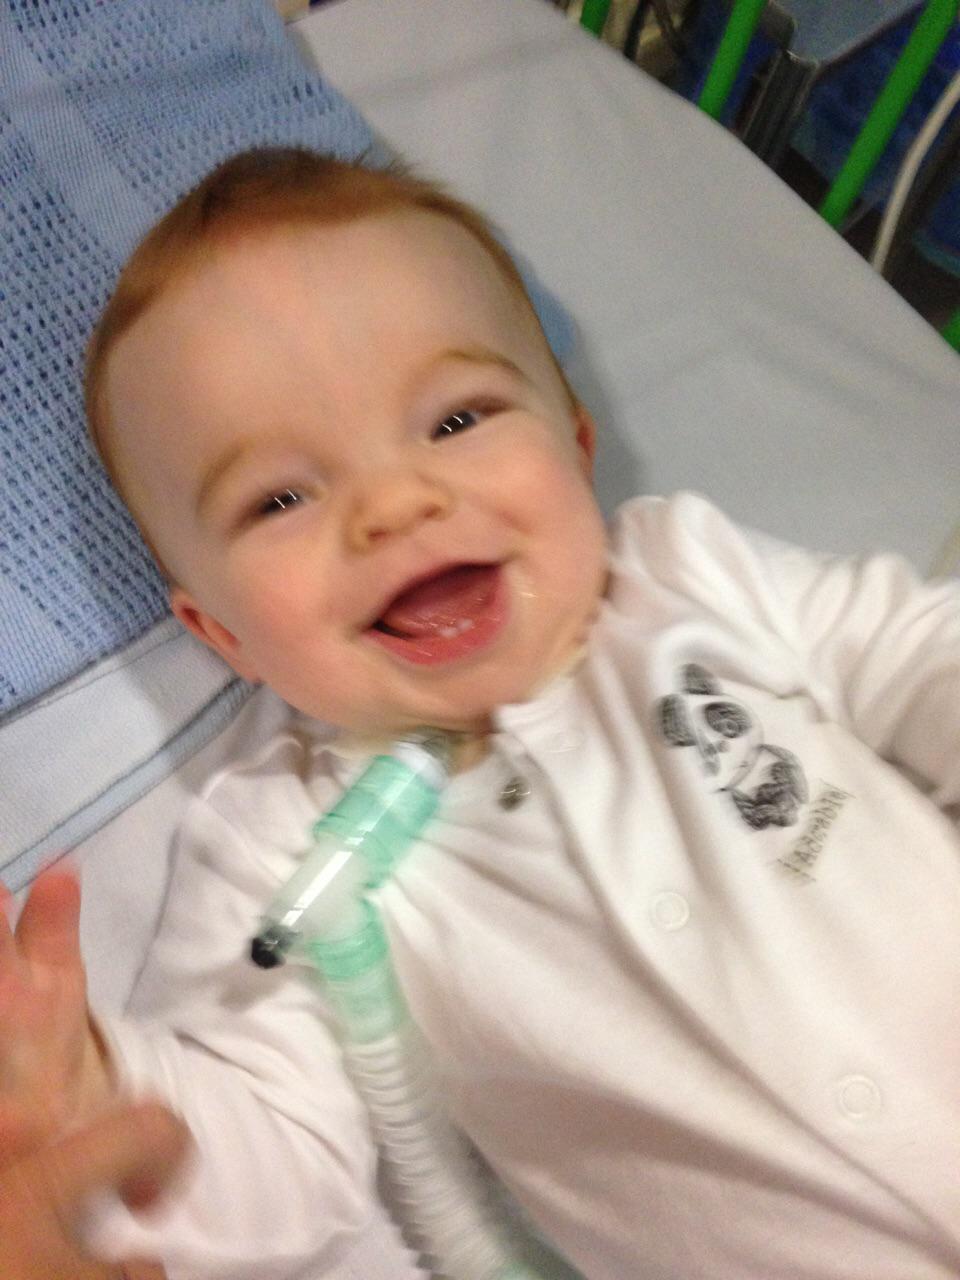 RT @natalieriley3: @msm4rsh retweet please for baby patrick http://t.co/Q5x2IAjve9 party@rmhm fb Patrick Lillis smile http://t.co/npG48qHqGp